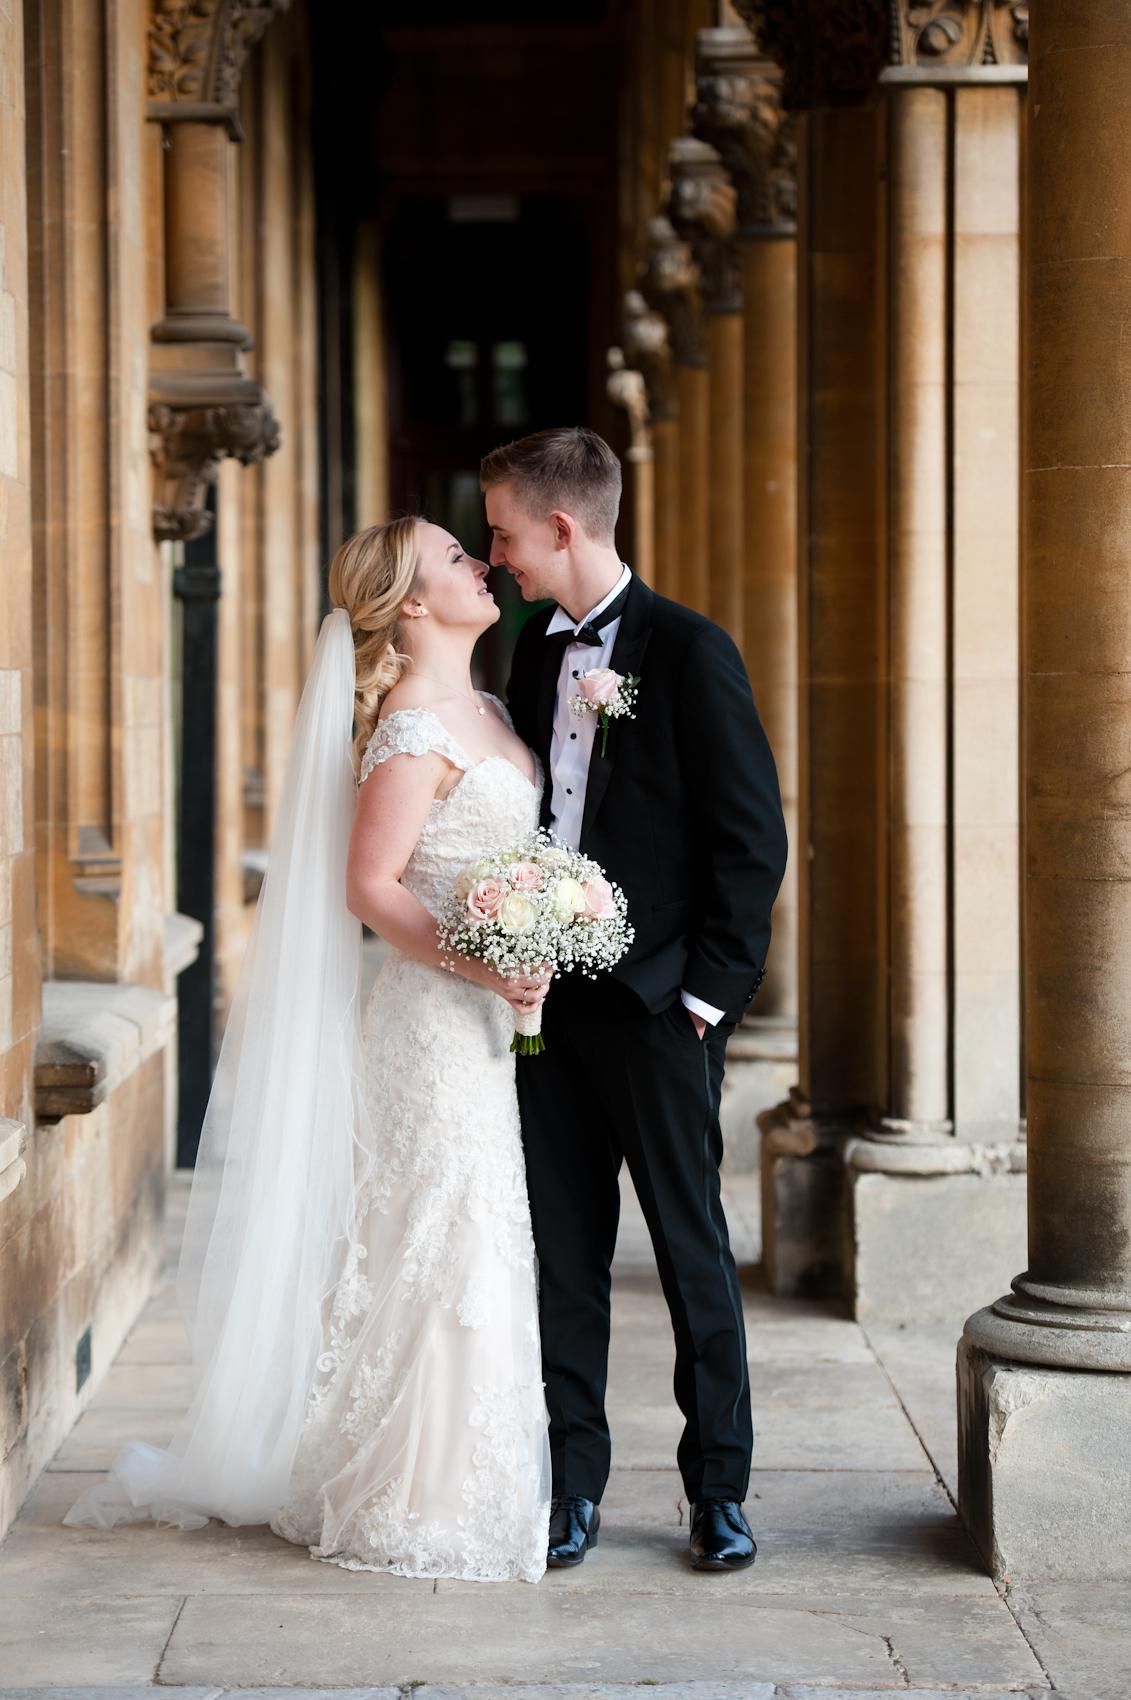 Declan & Emma wedding (12 of 29).jpg